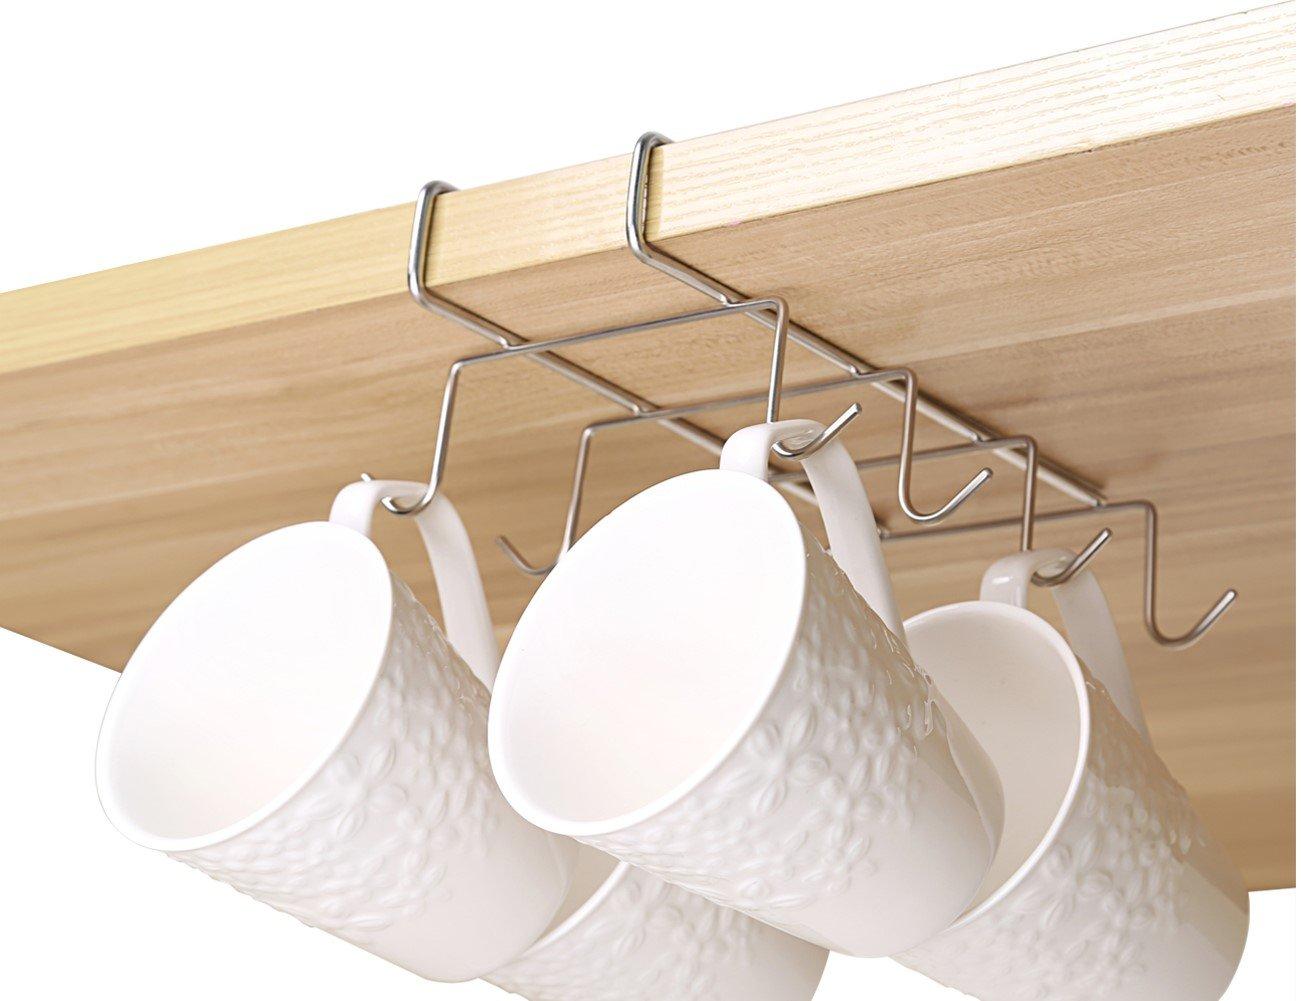 Bafvt Coffee Mug Holder - 304 Stainless Steel 8 Hooks Cup Rack Under Shelf, Fit for the Cabinet 0.8'' or Less